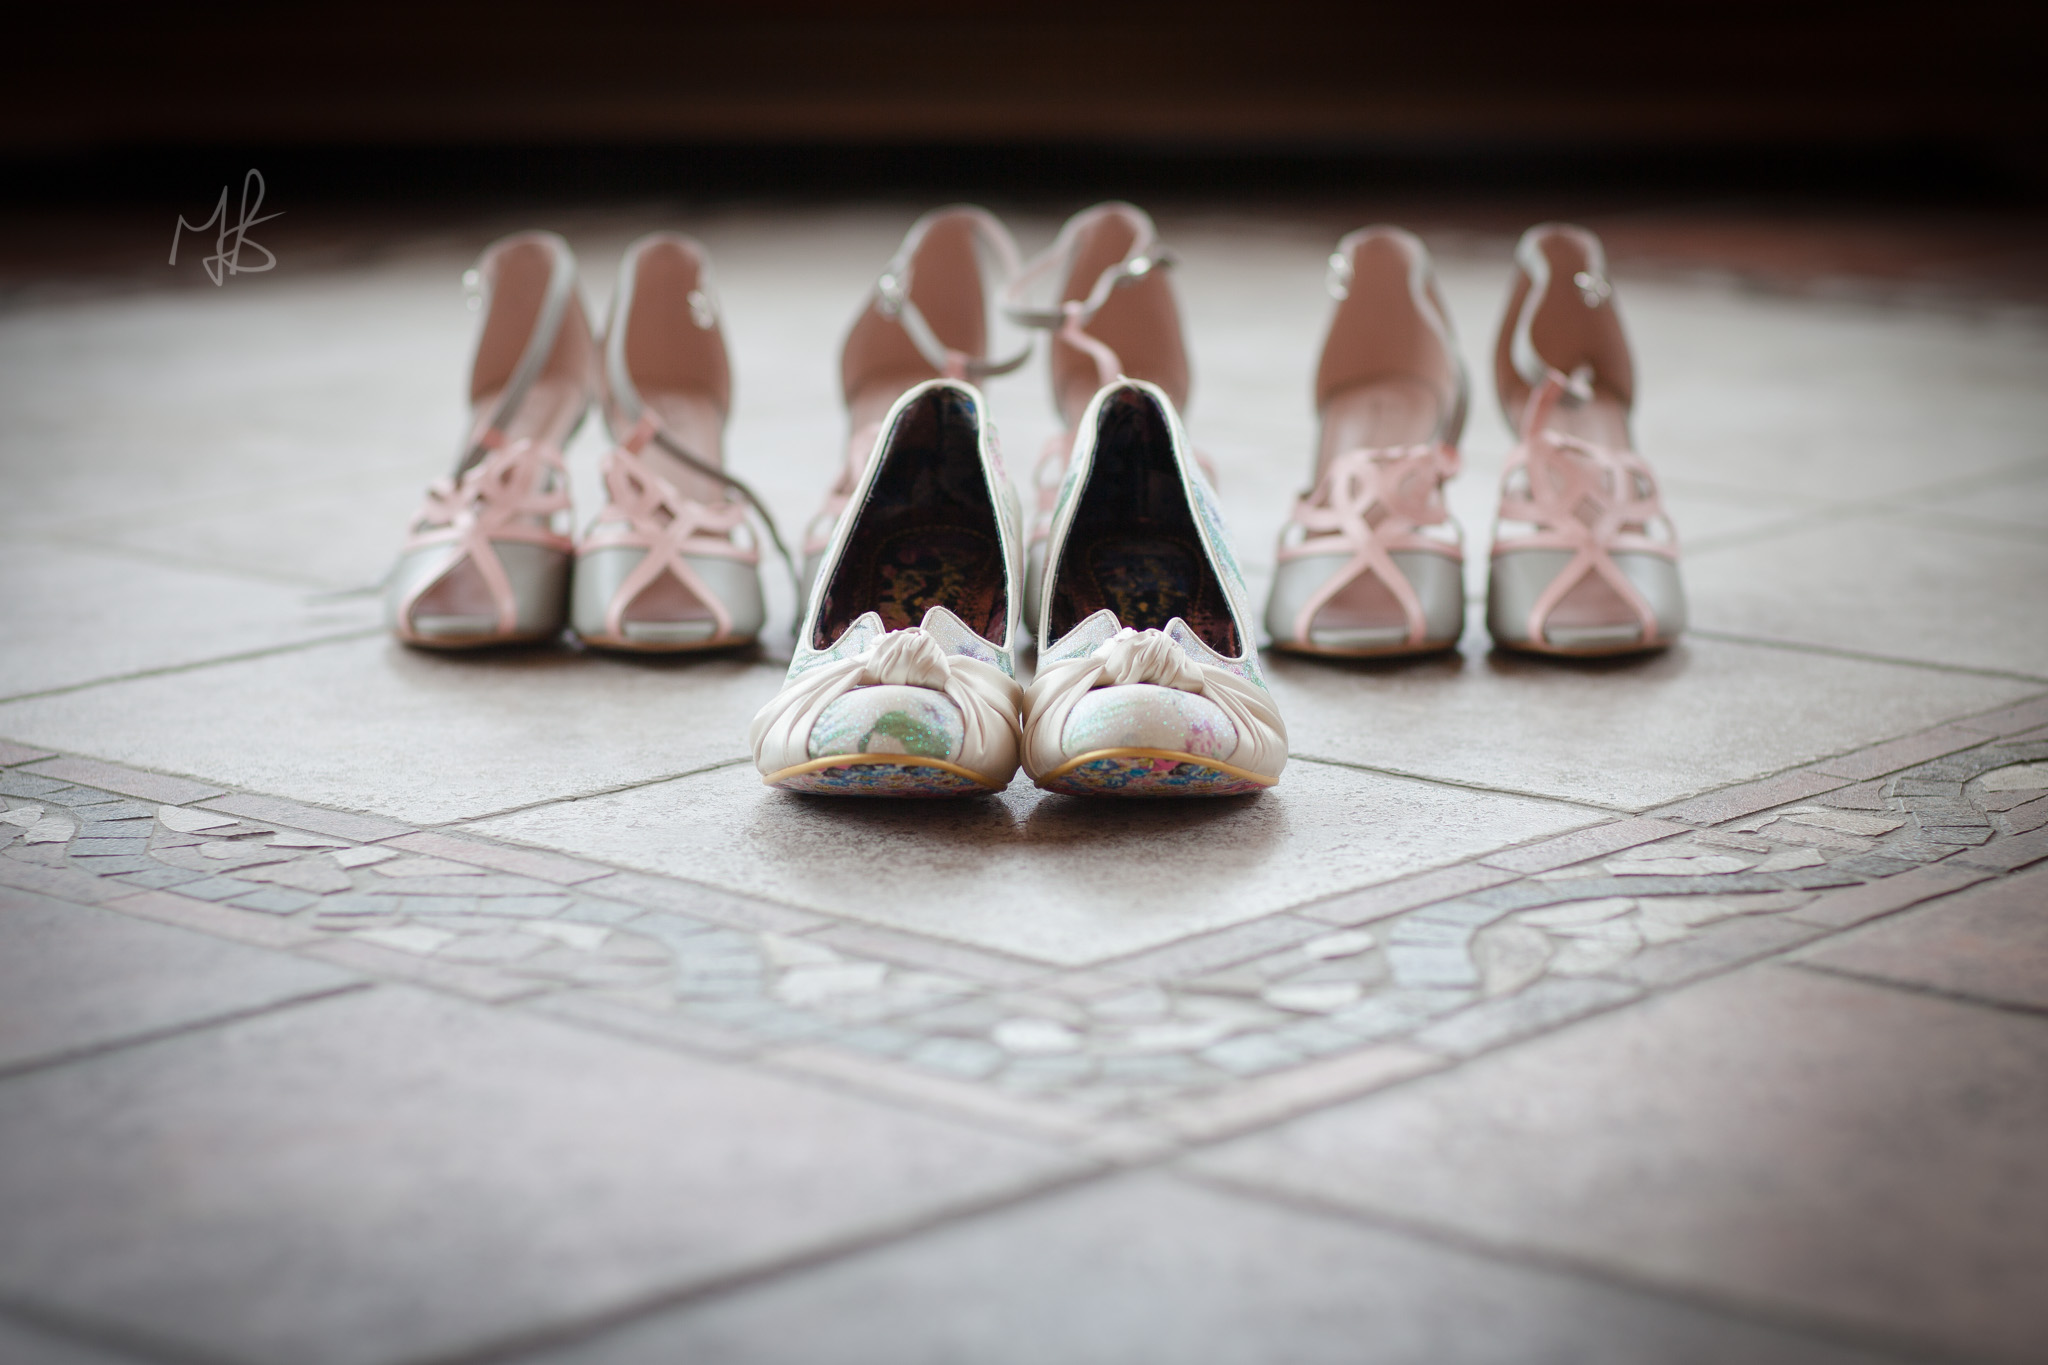 Northern-Ireland-Wedding-Photographer-Mark-Barnes-Ballymena_wedding-photography-Leighinmohr-House-Seamas_Alanna_For-web-8.jpg